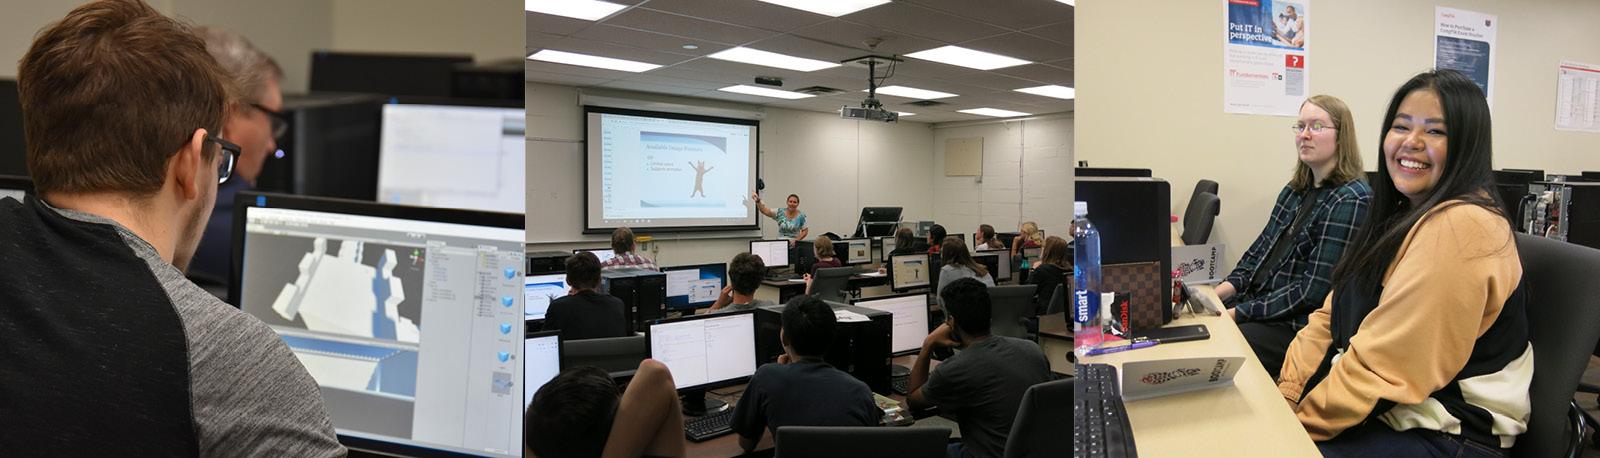 Bootcamp: Coding & Creativity Series